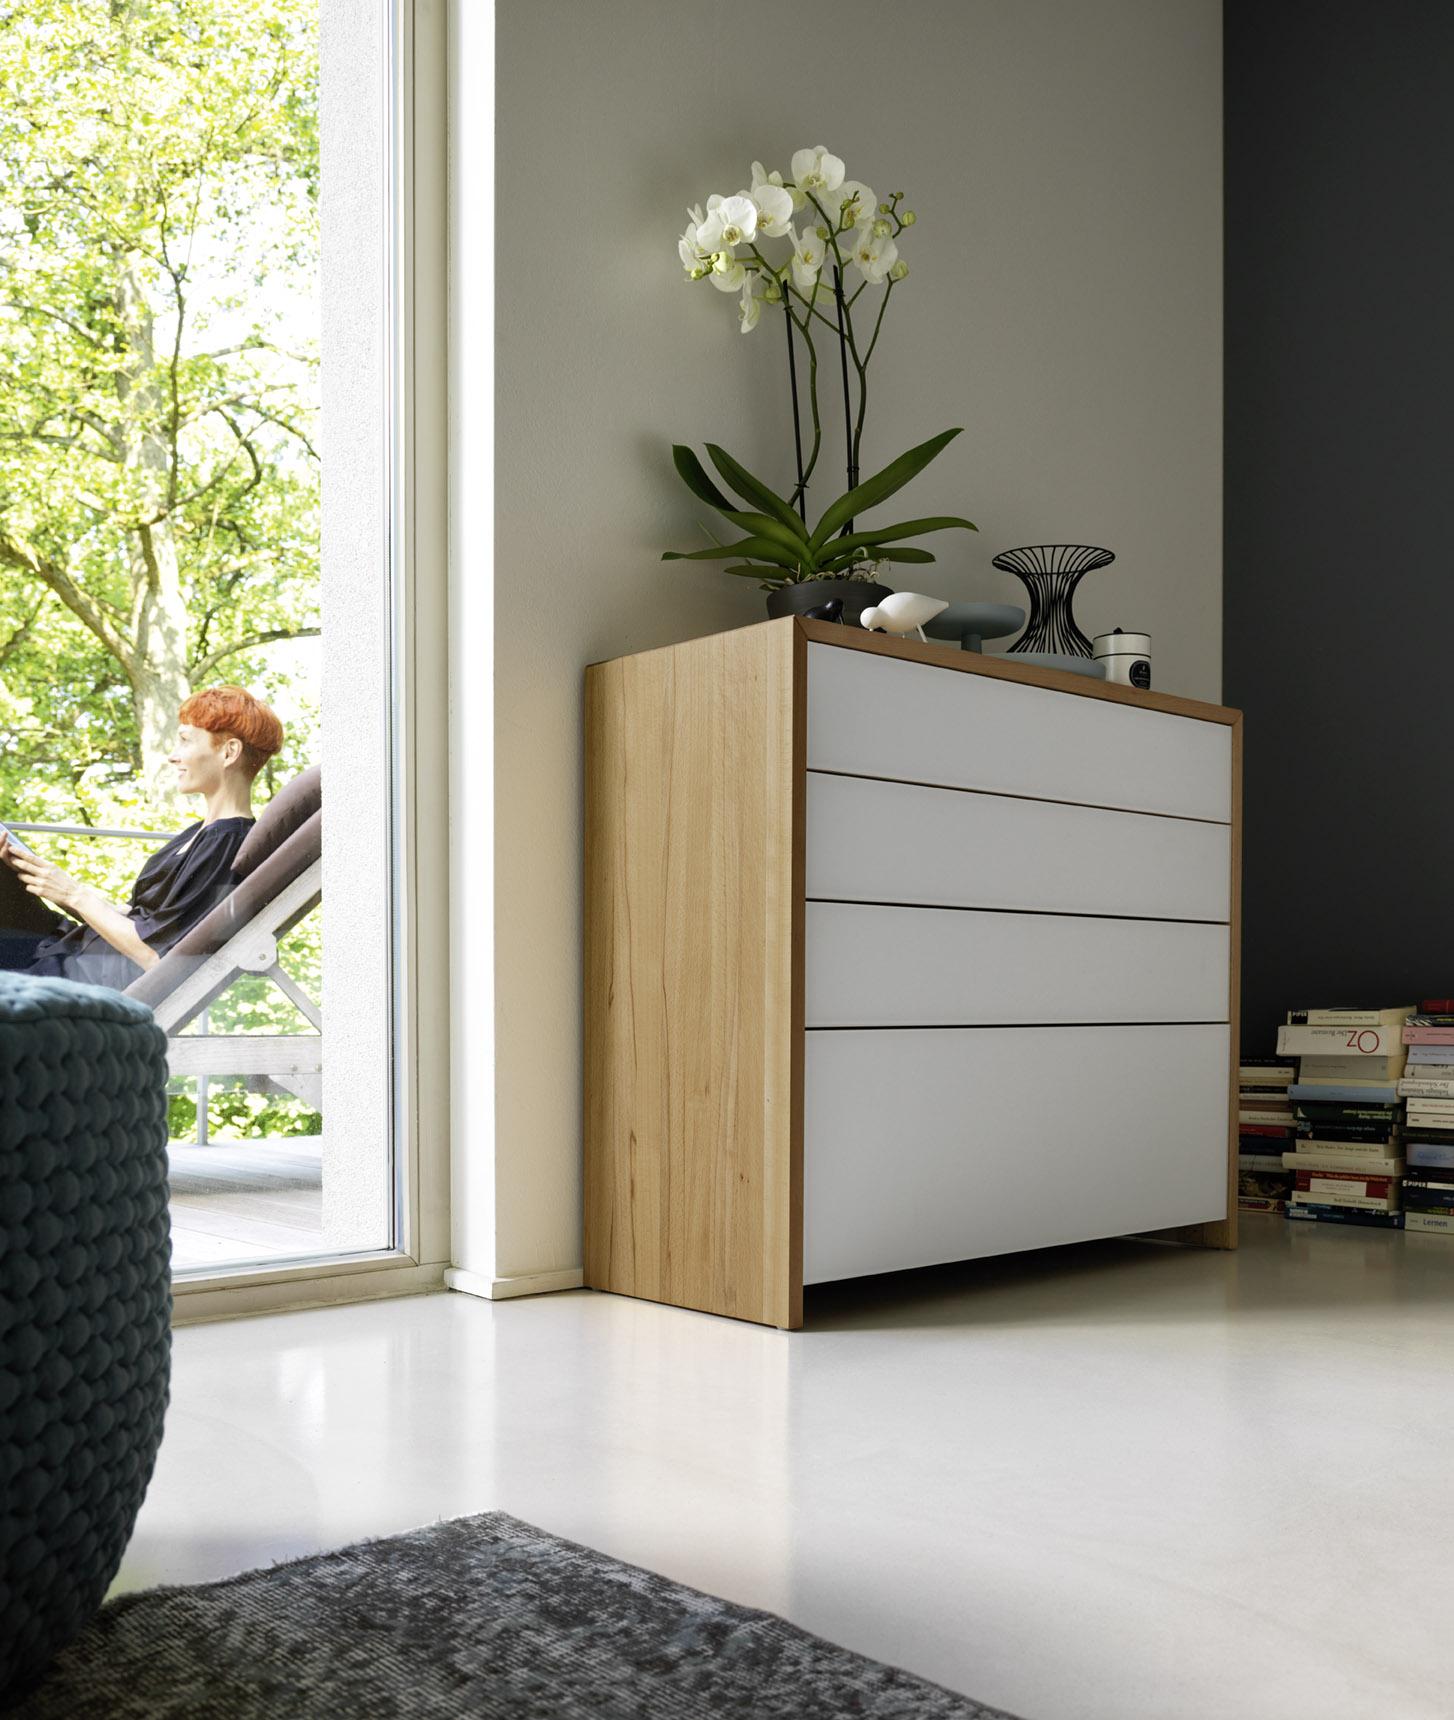 Beautiful Team 7 Küchen Abverkauf Photos - Ideas & Design 2018 ...